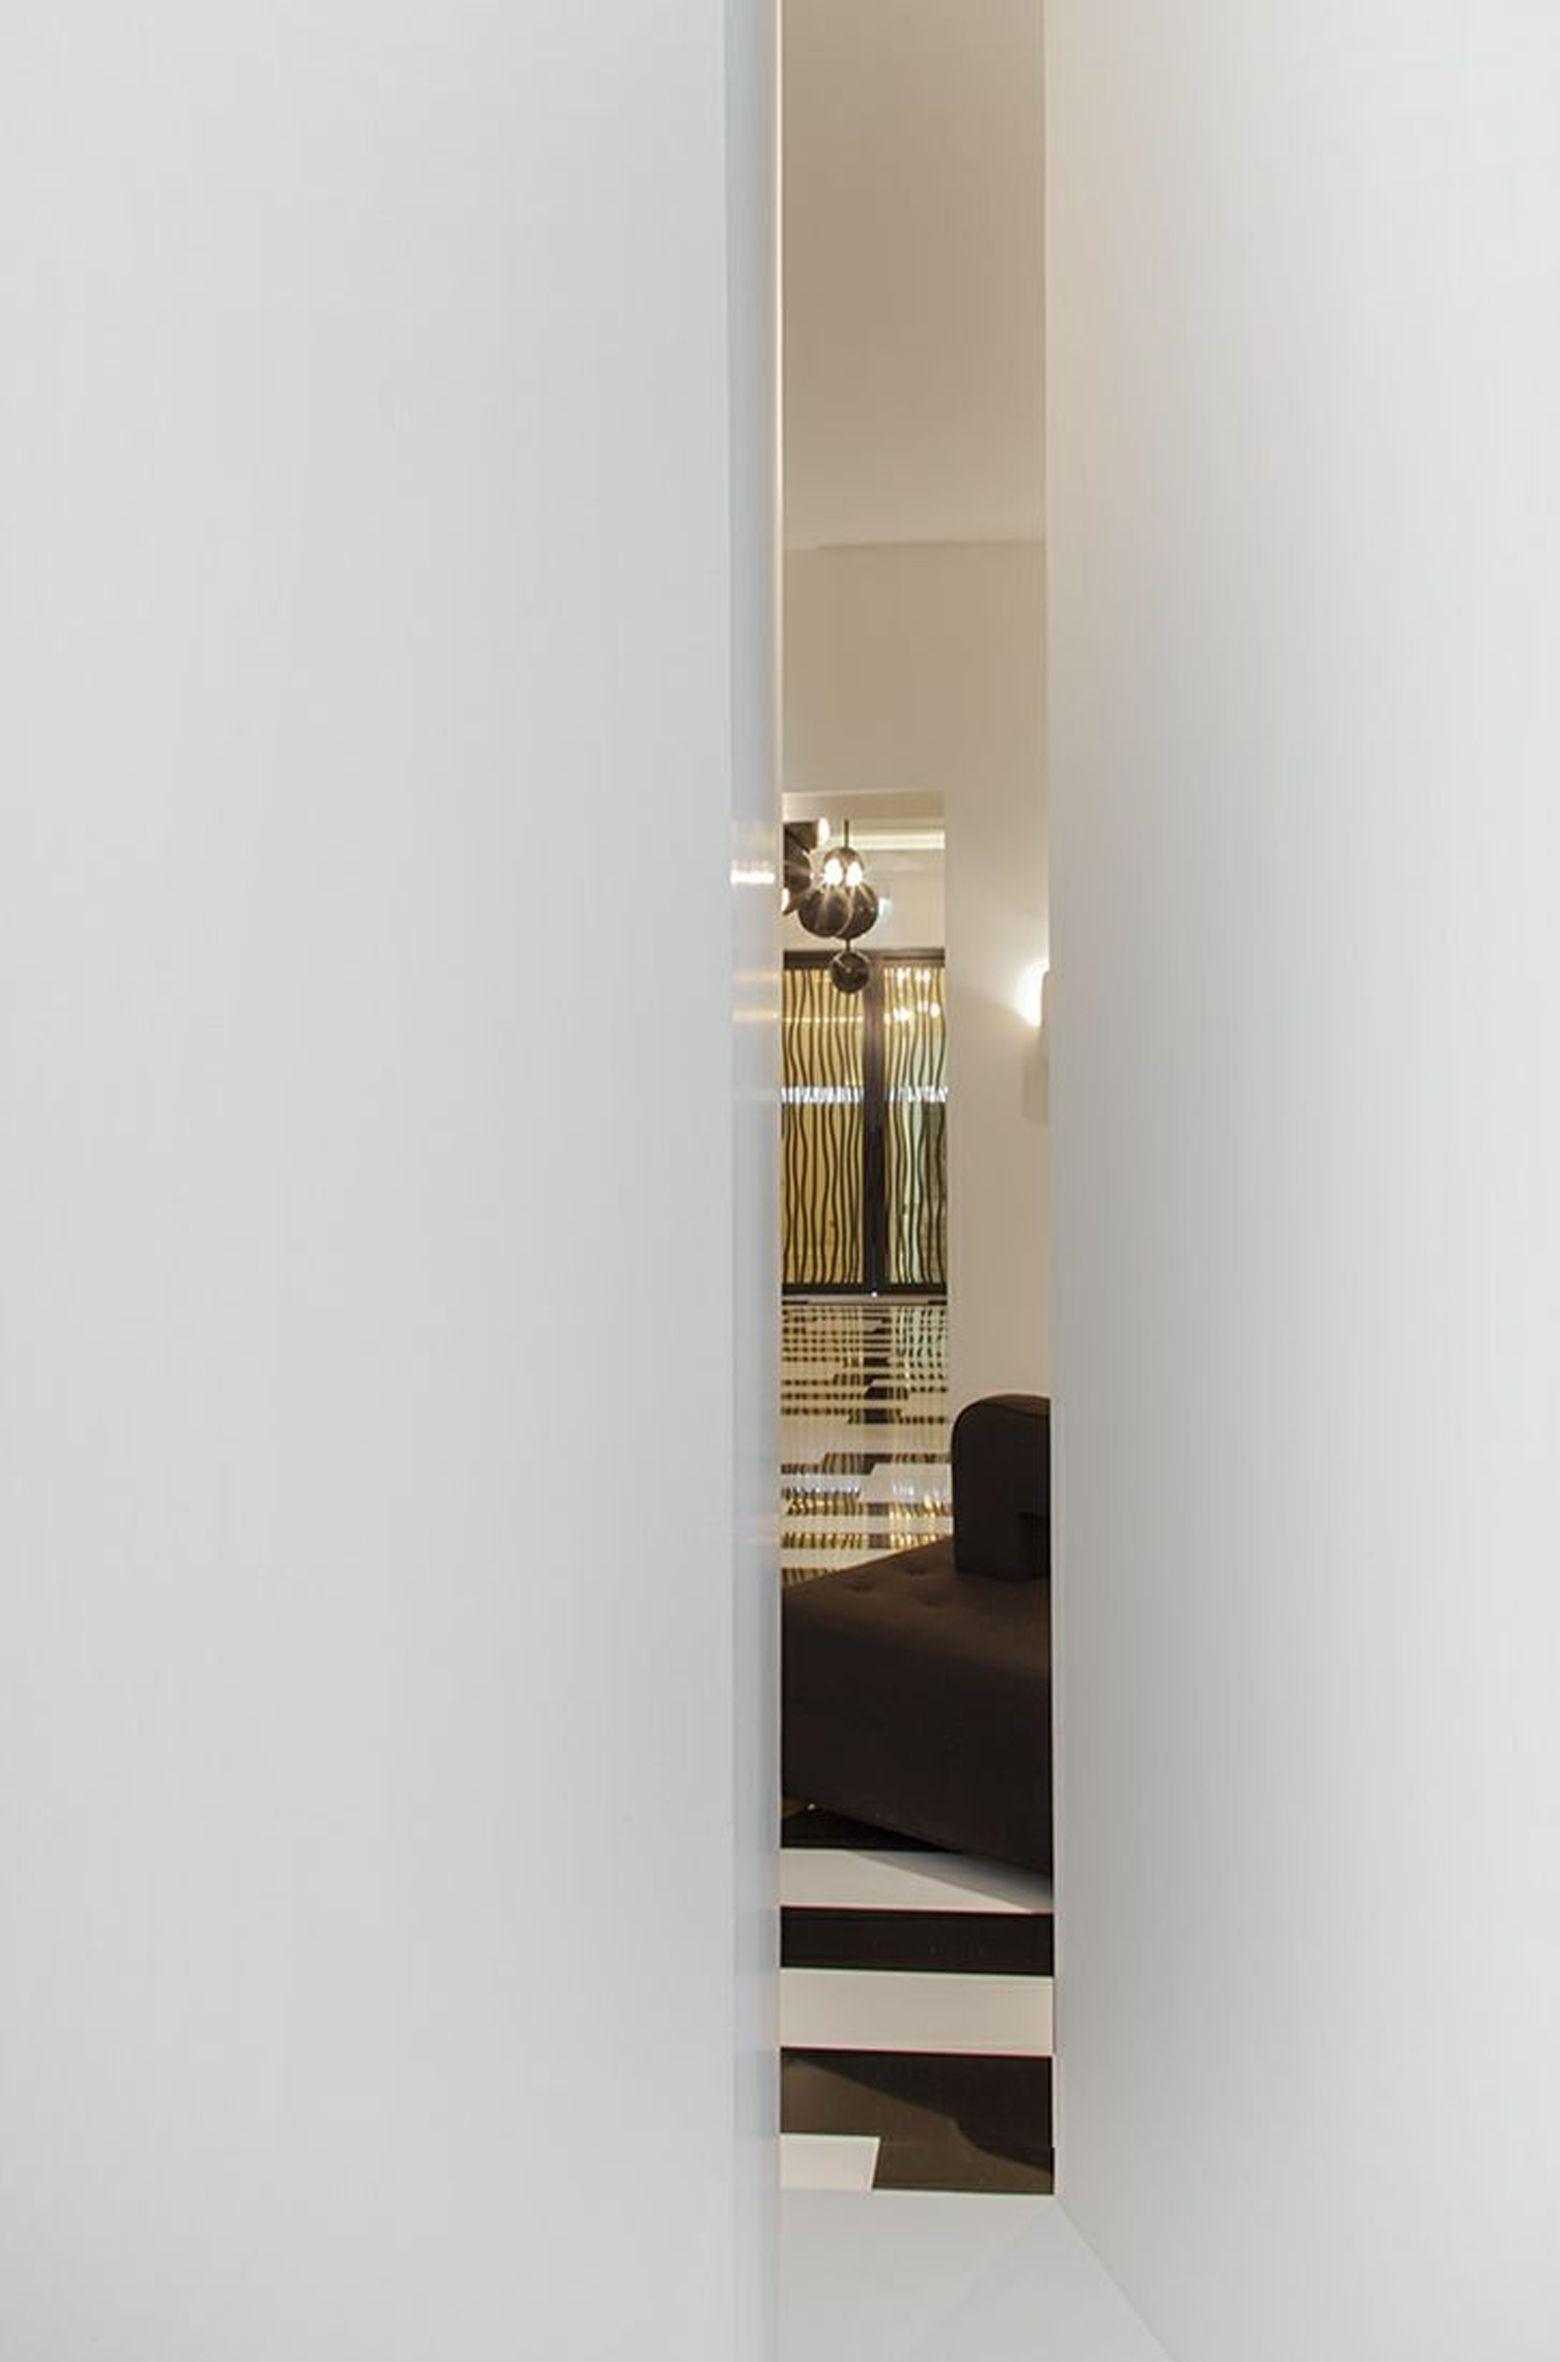 Lobby, Hotel Marignan Paris designed by Pierre Yovanovitch